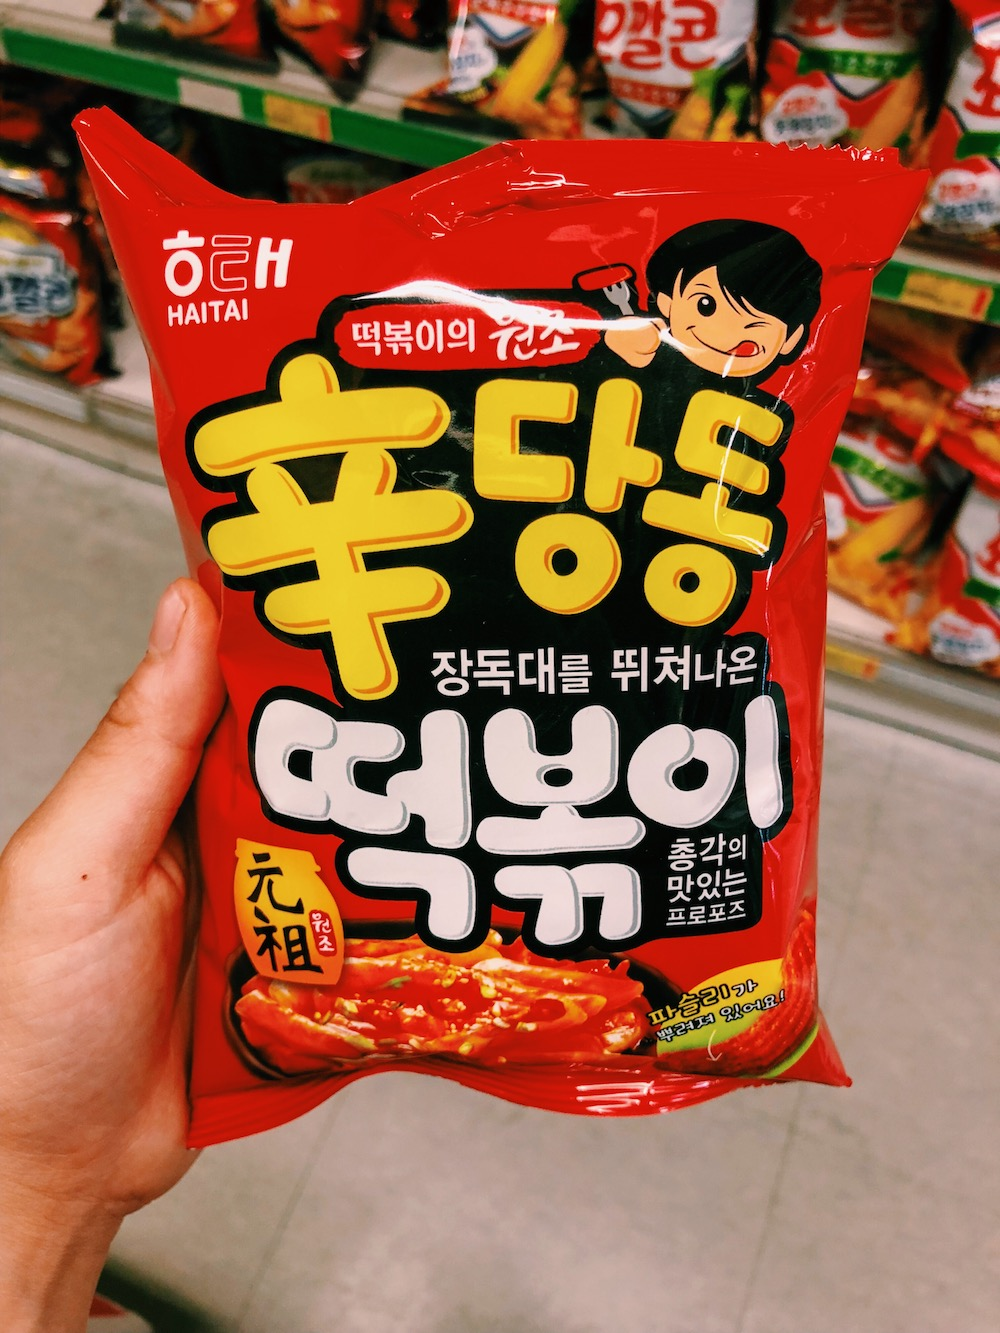 Tteokbokki chips - vegan